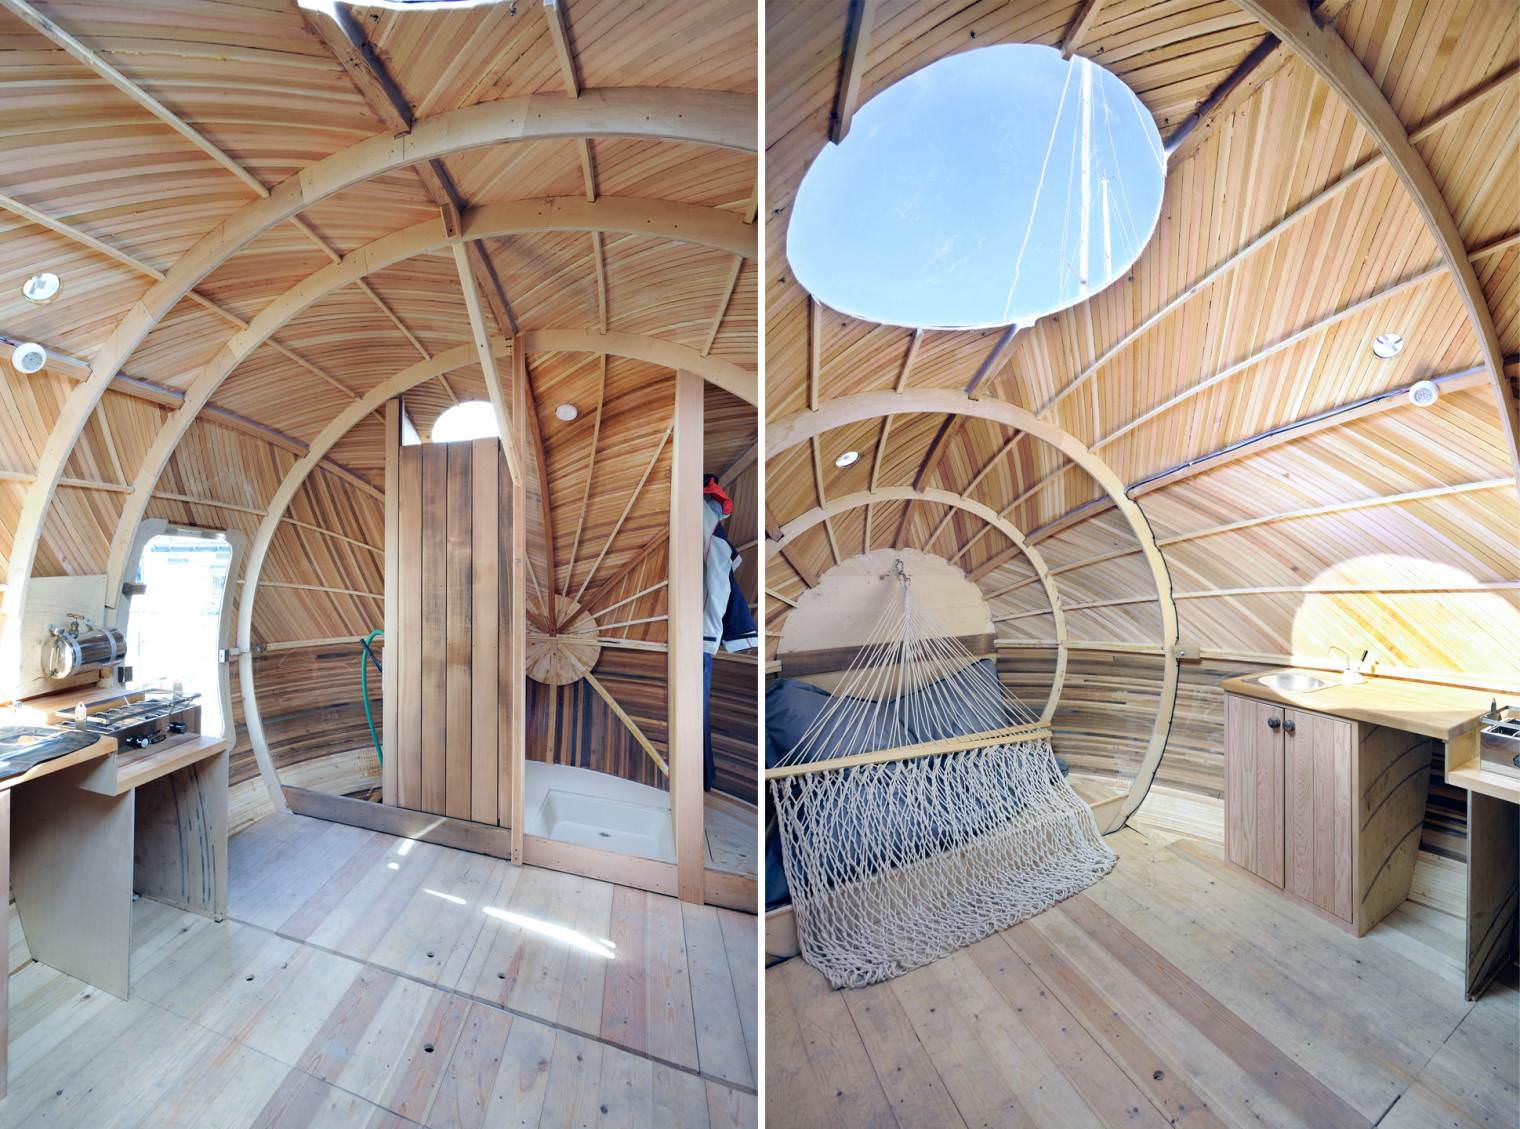 Spazi interni / PAD Studio Architects